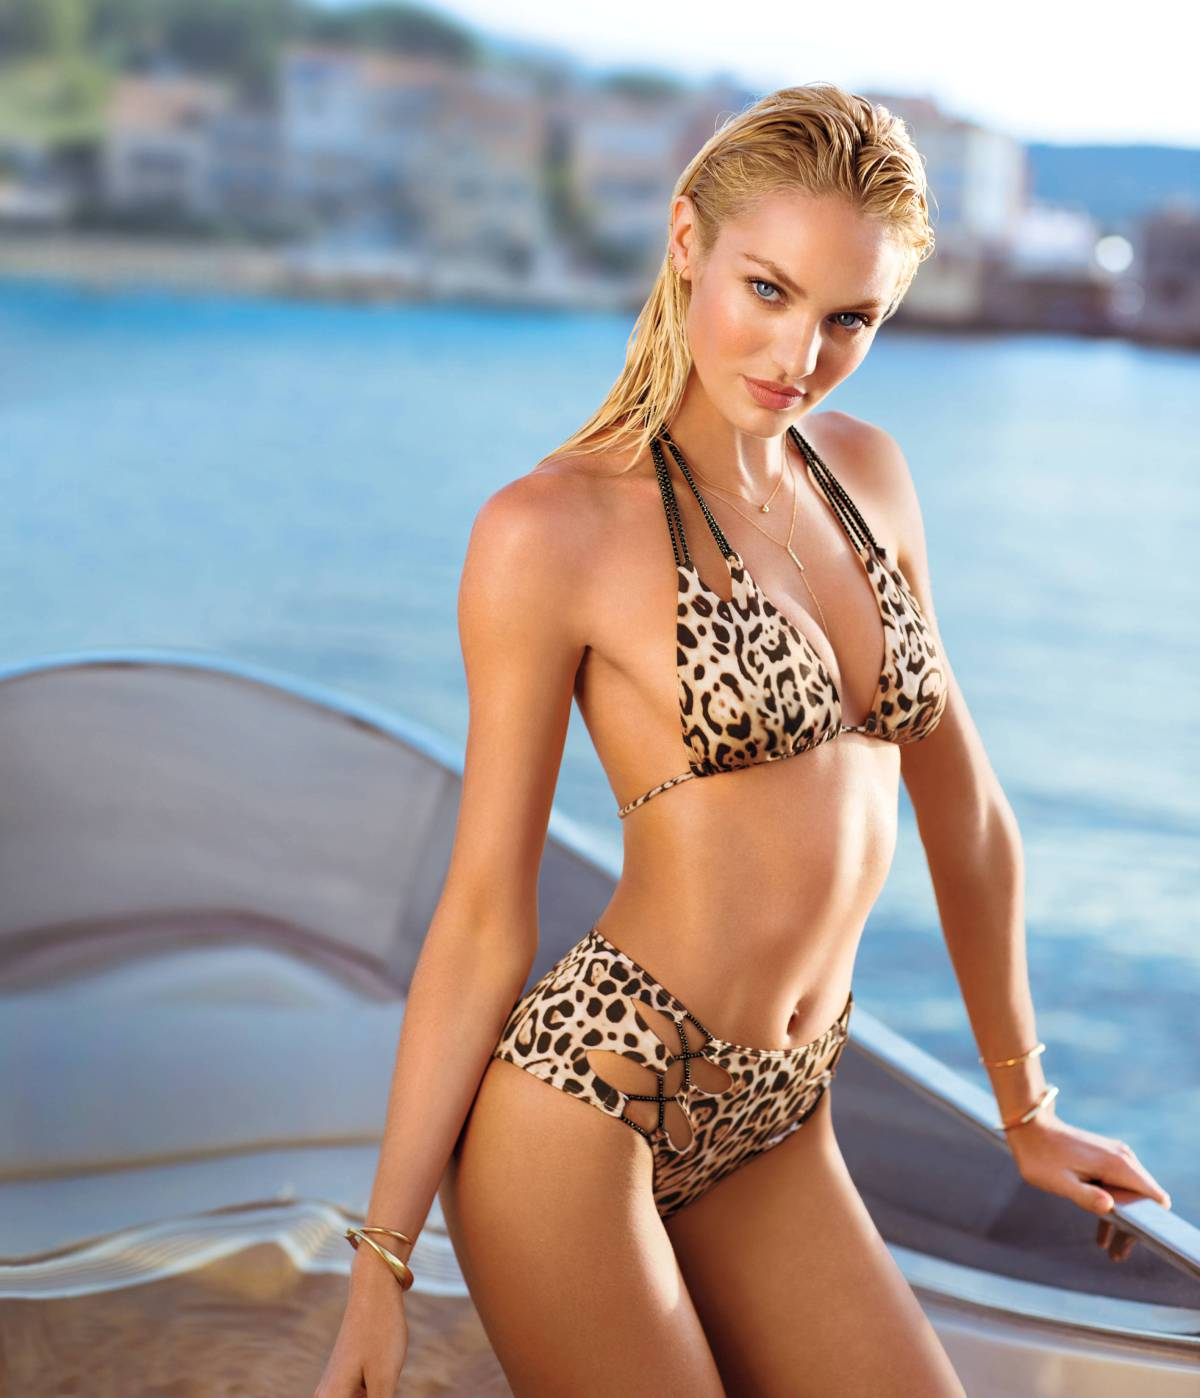 Candice swanepoel victorias secret swimwear feb 2014 hq photo shoot - 2019 year